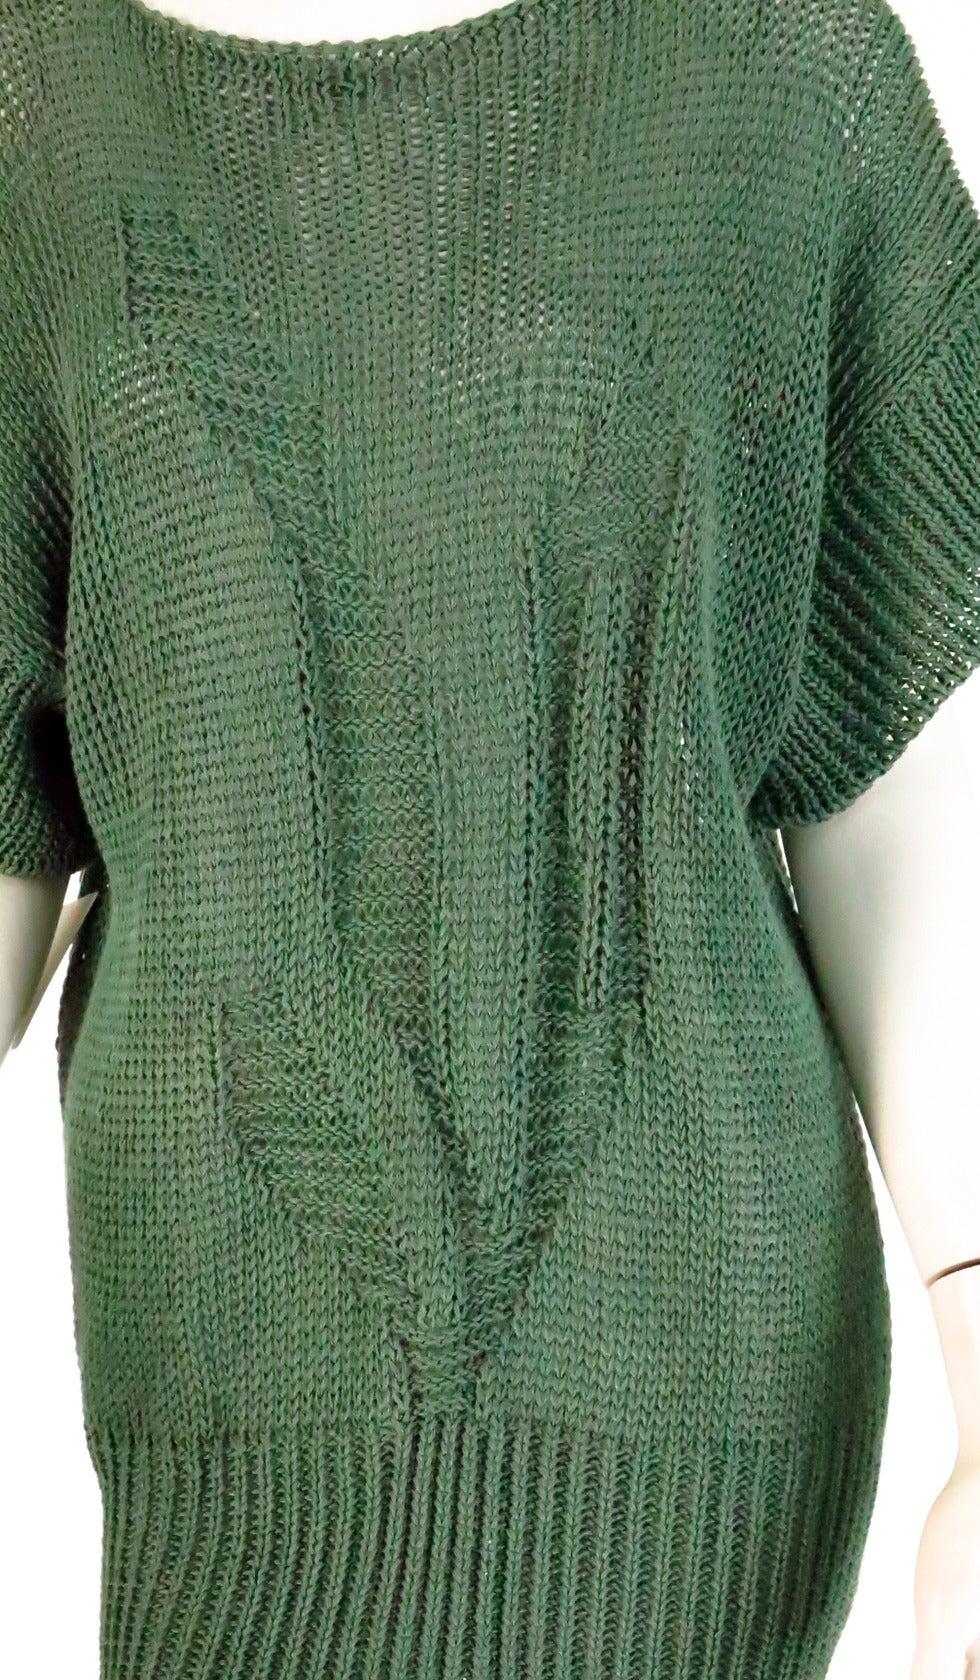 1980s Jil Sander pine green sweater knit tunic For Sale 3